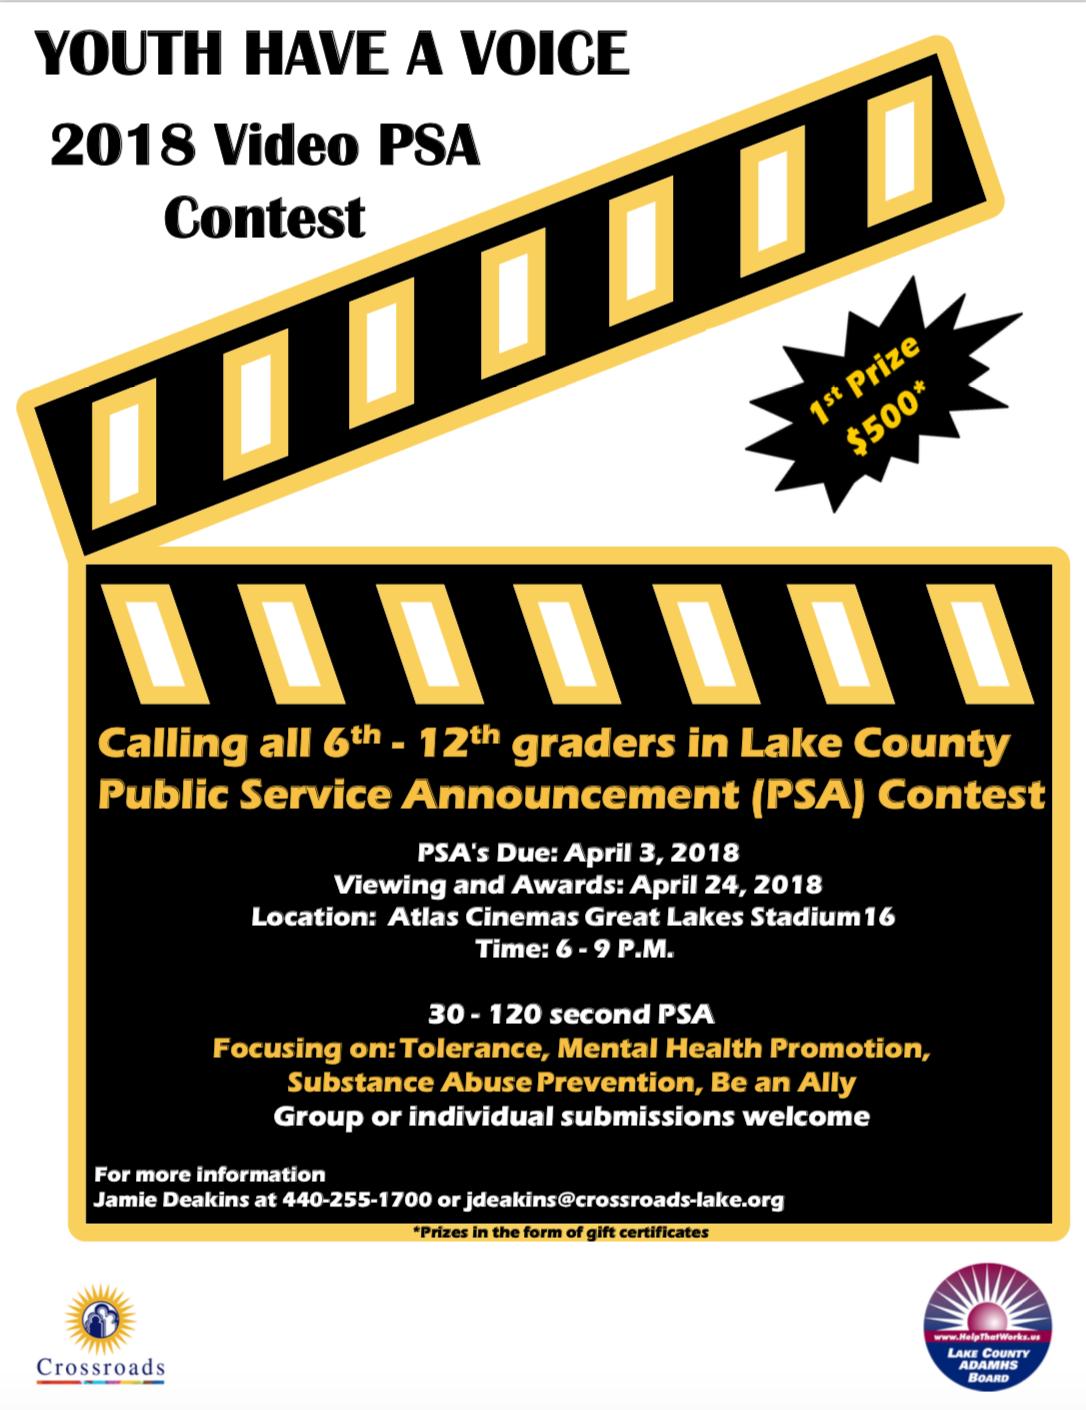 Video PSA Contest